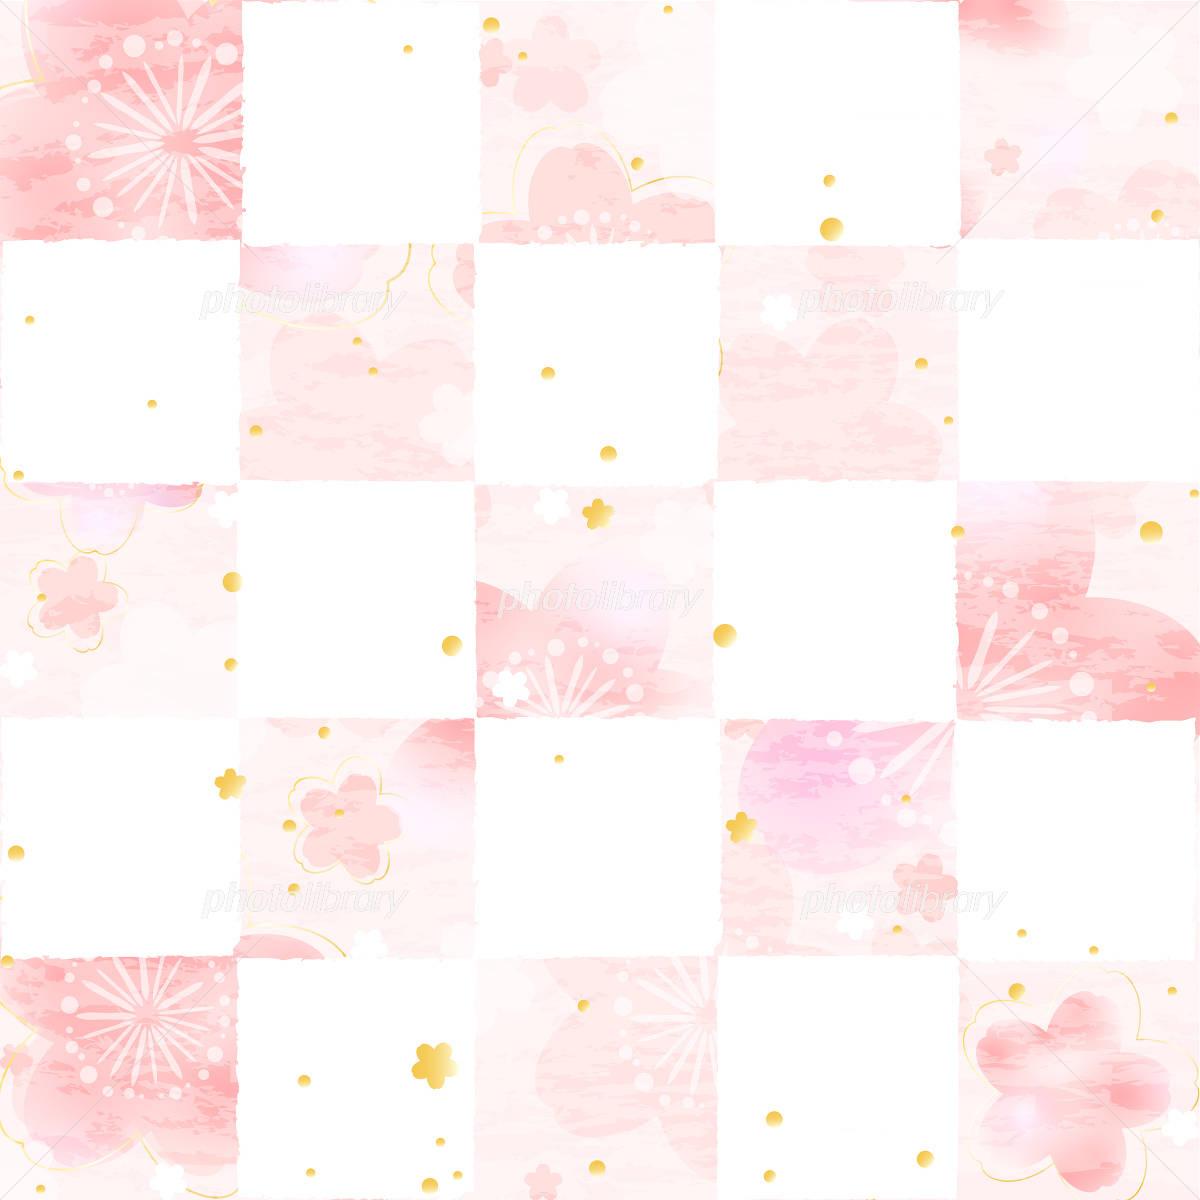 Sakura checkered paper style イラスト素材